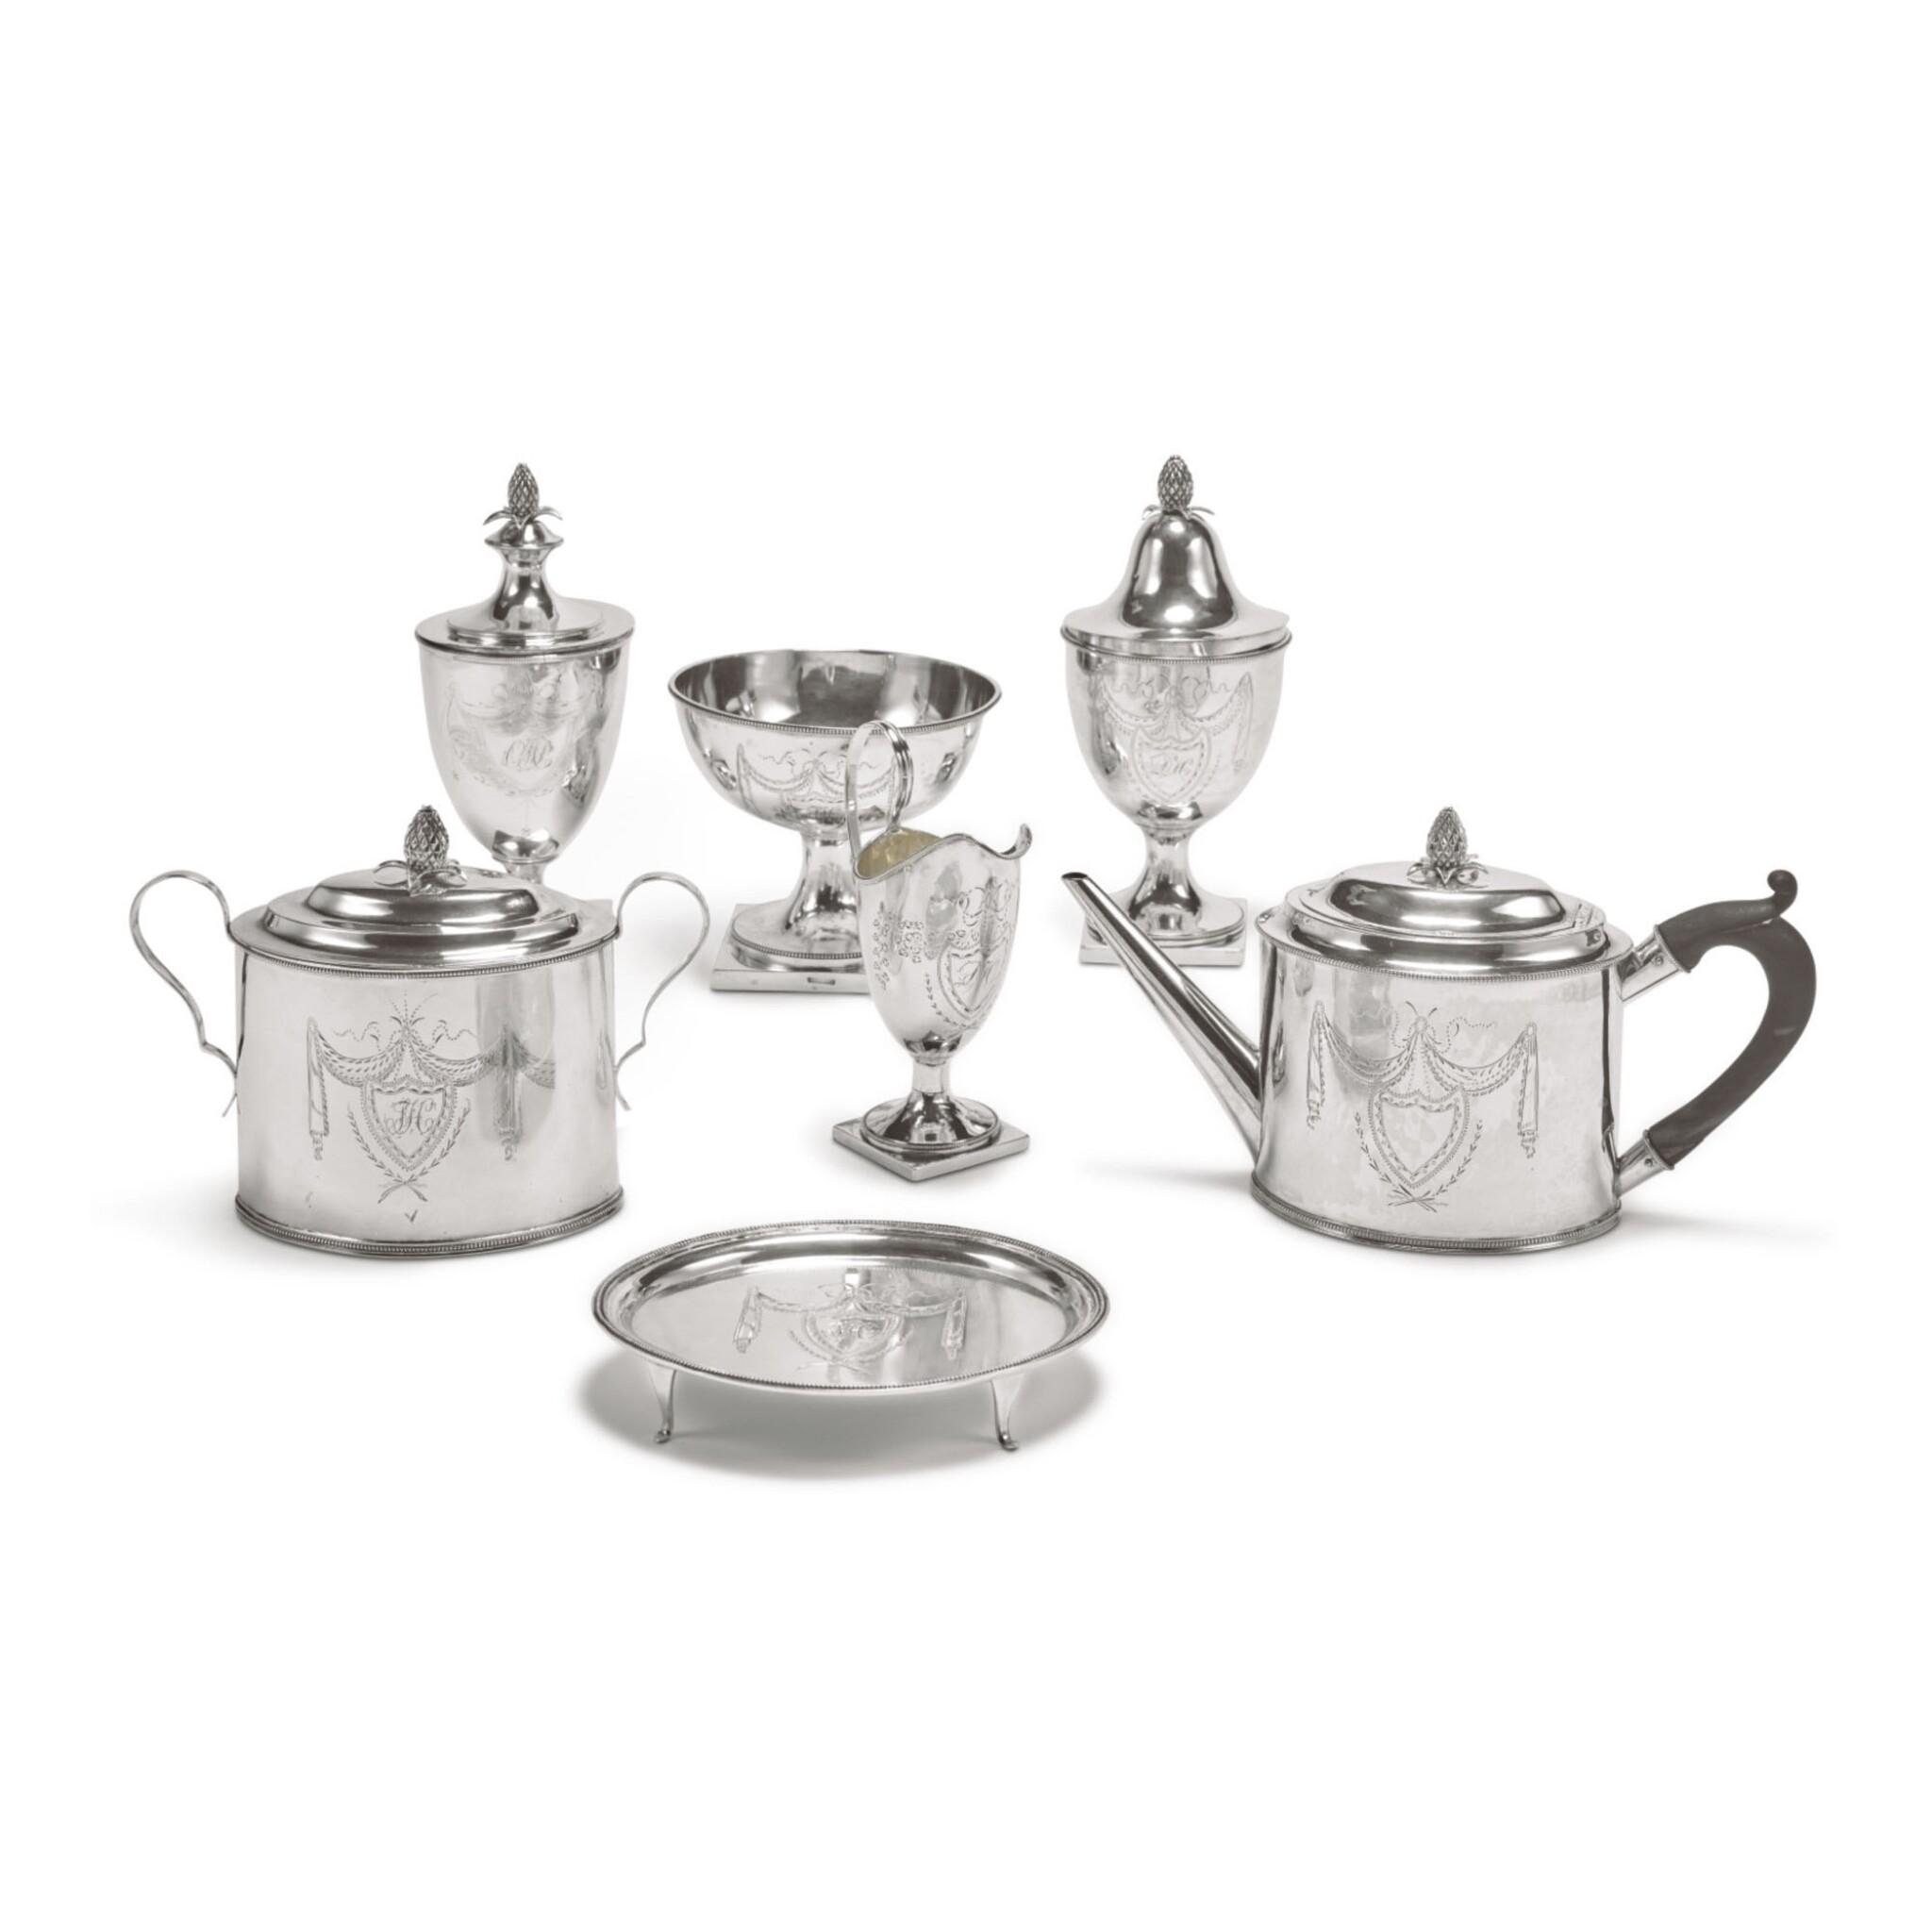 View full screen - View 1 of Lot 1803. AN AMERICAN SILVER SIX-PIECE TEA SET, VAN VOORHIS & SCHANCK, NEW YORK, CIRCA 1790-1800.